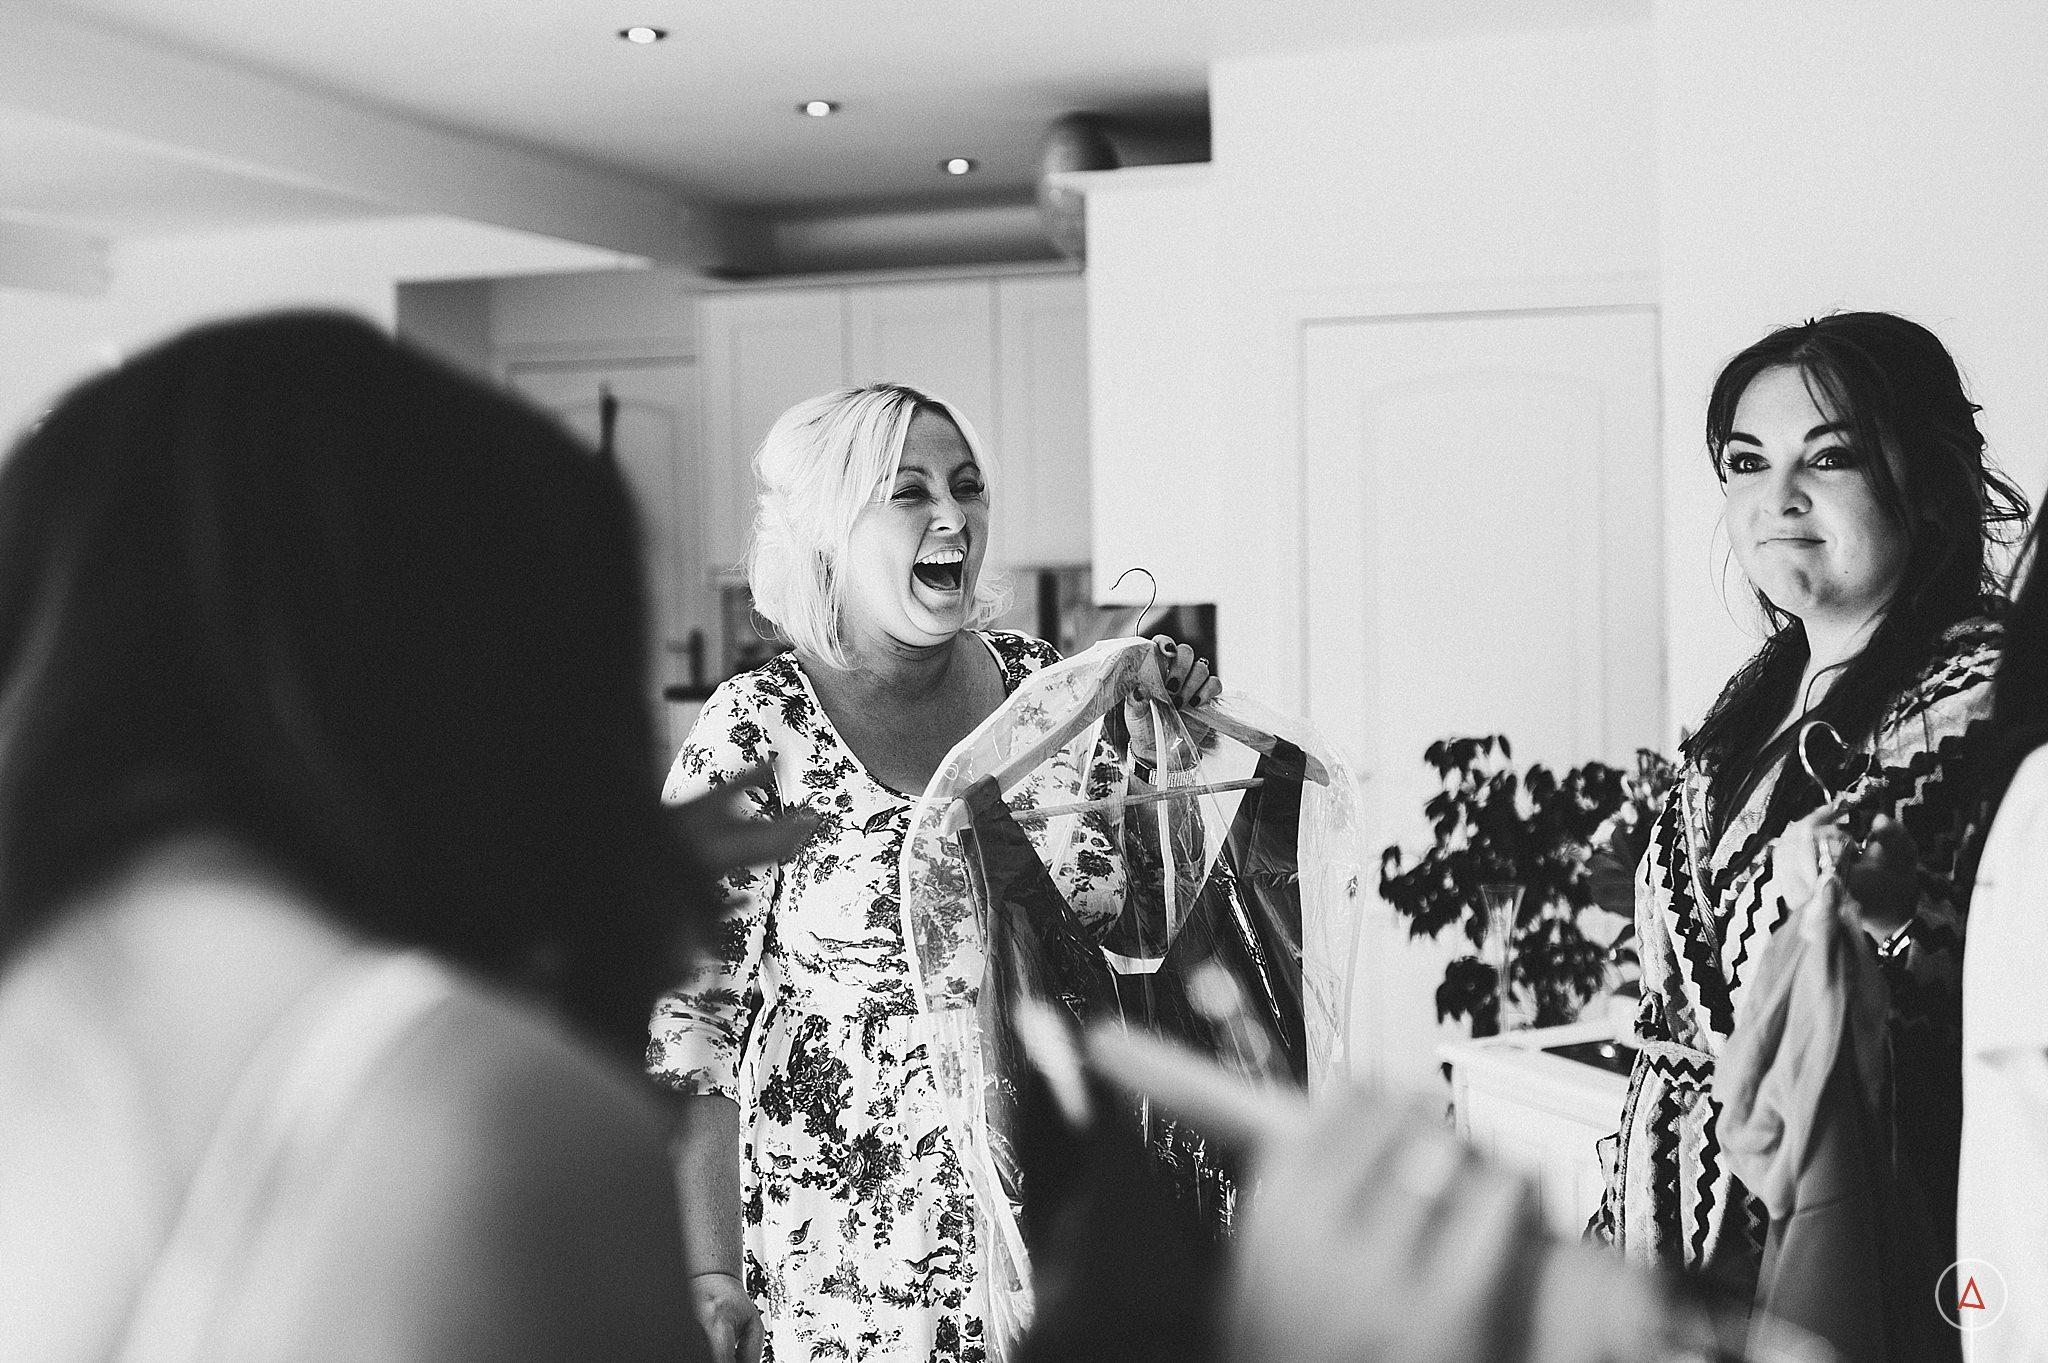 cardiff-wedding-photographer-aga-tomaszek_0341